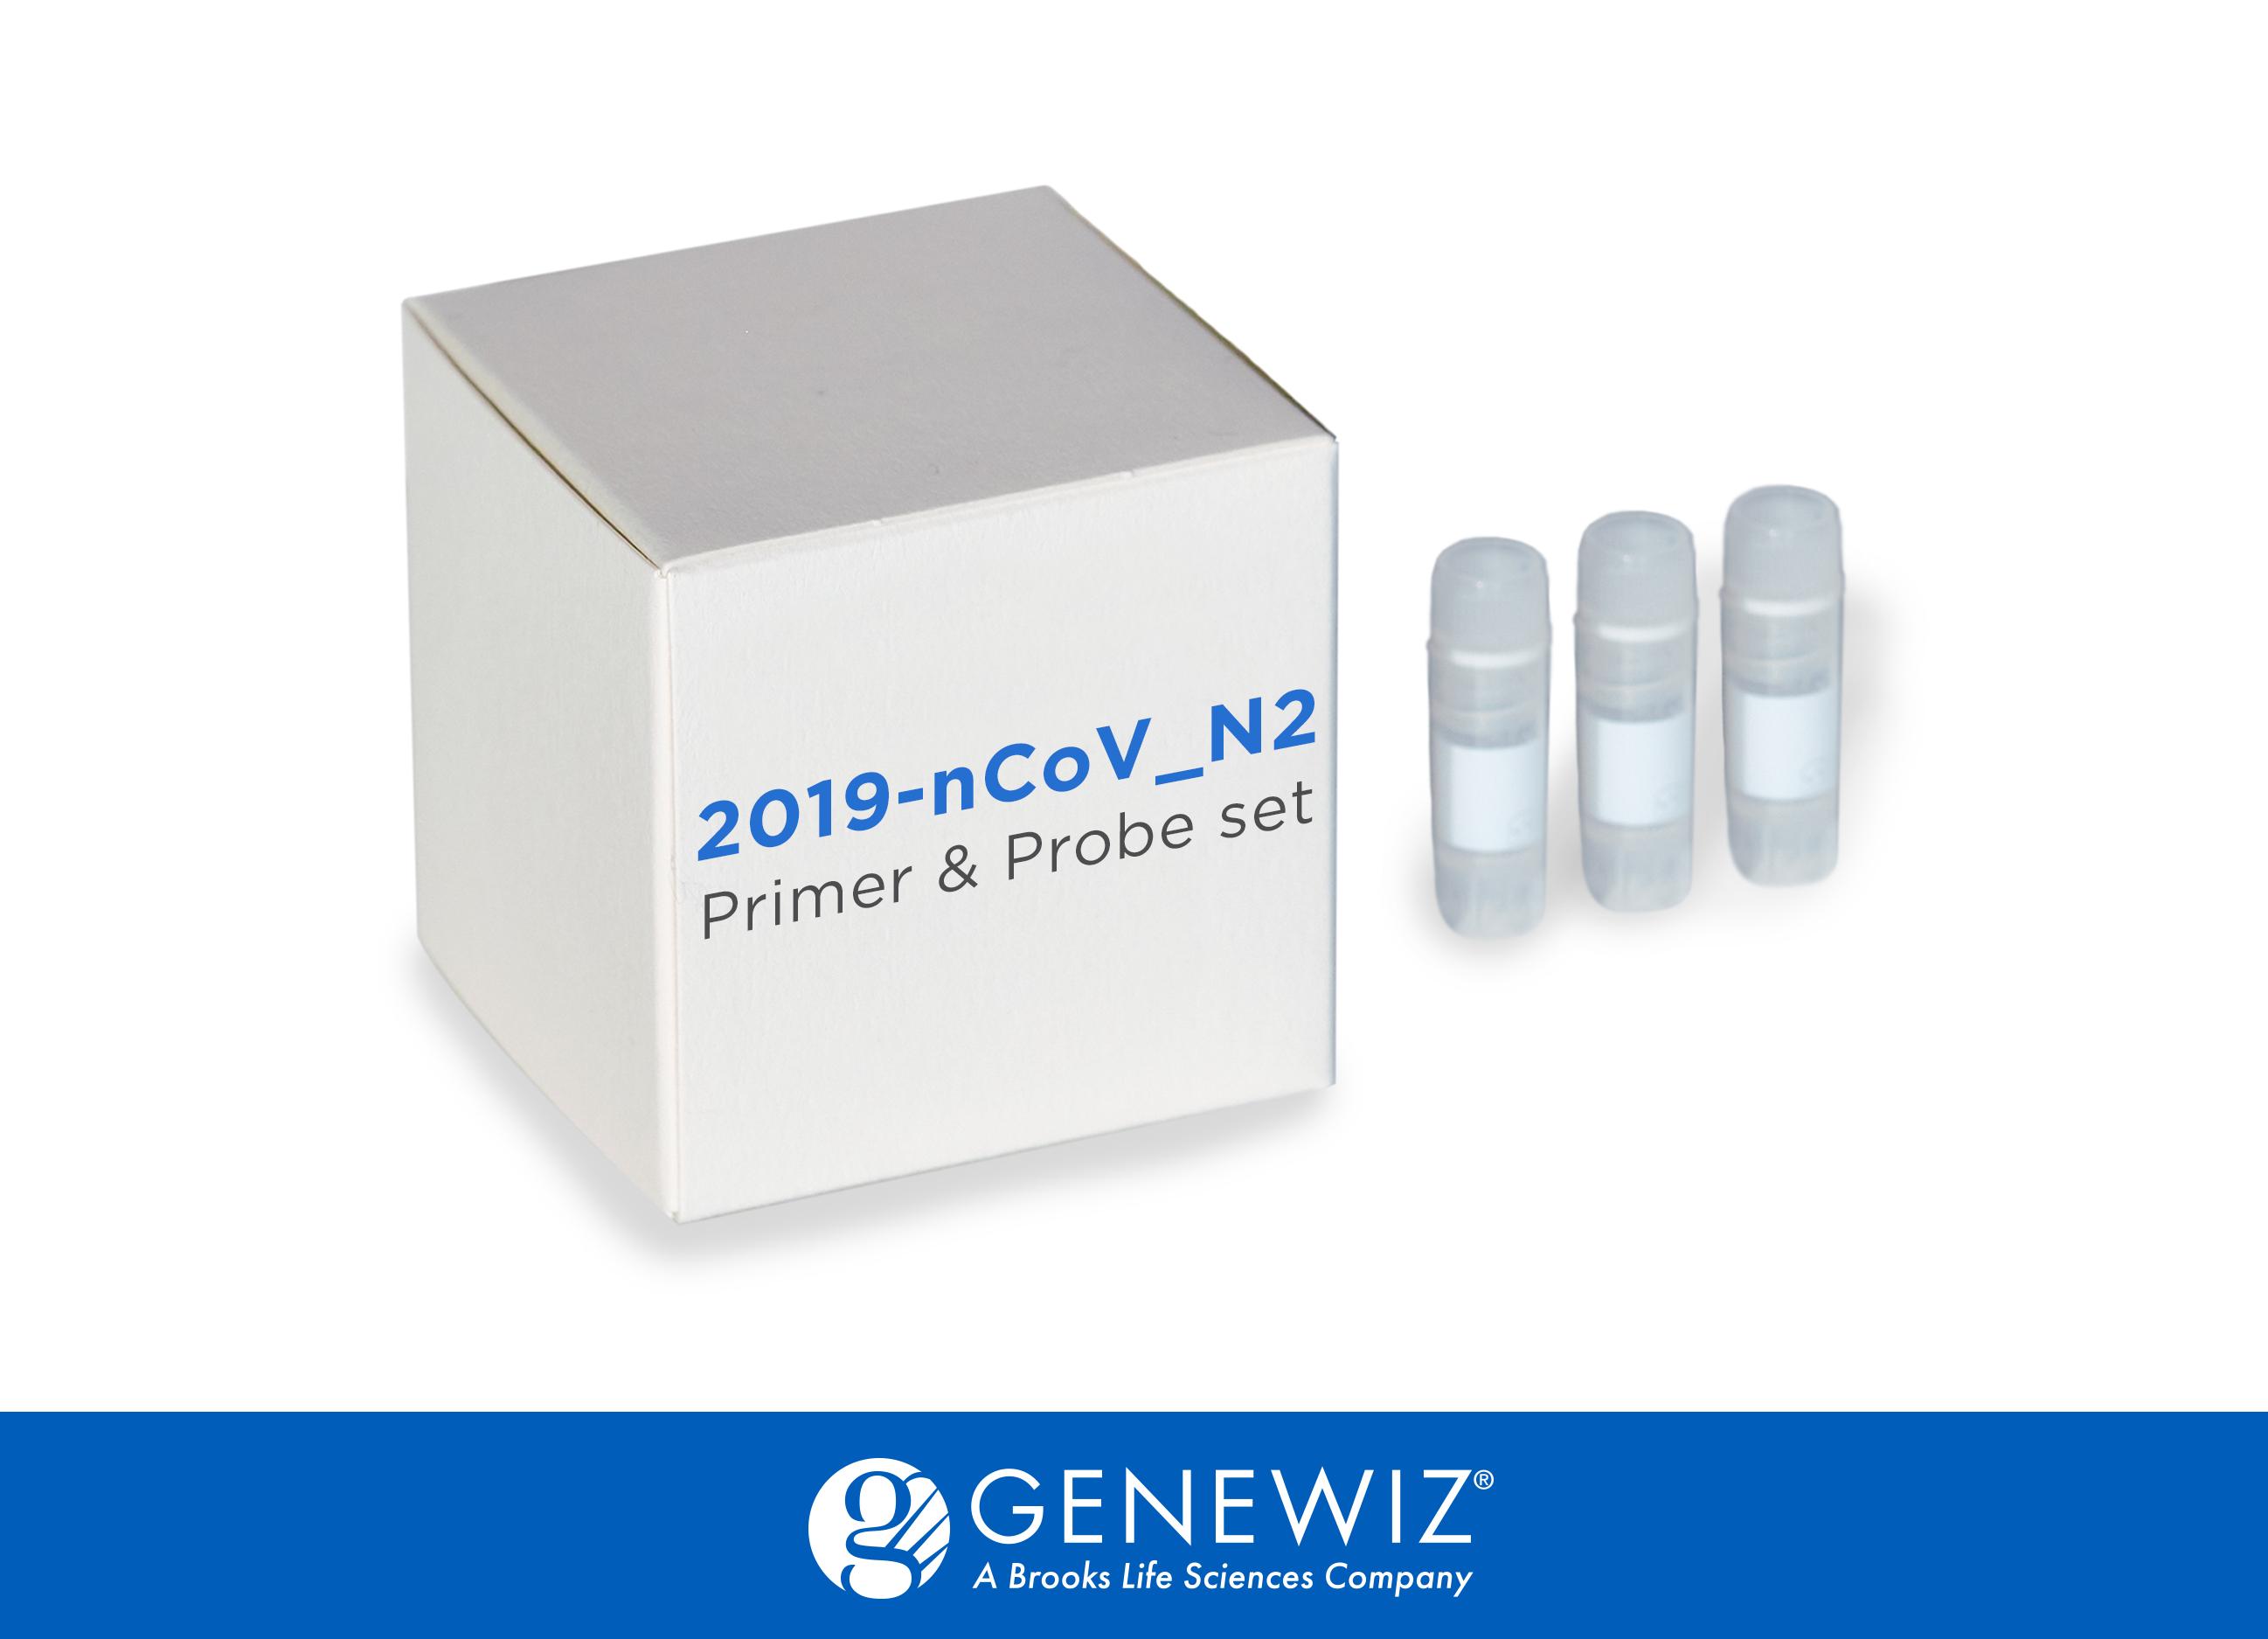 2019-nCoV_N2 Probe and Primer Set